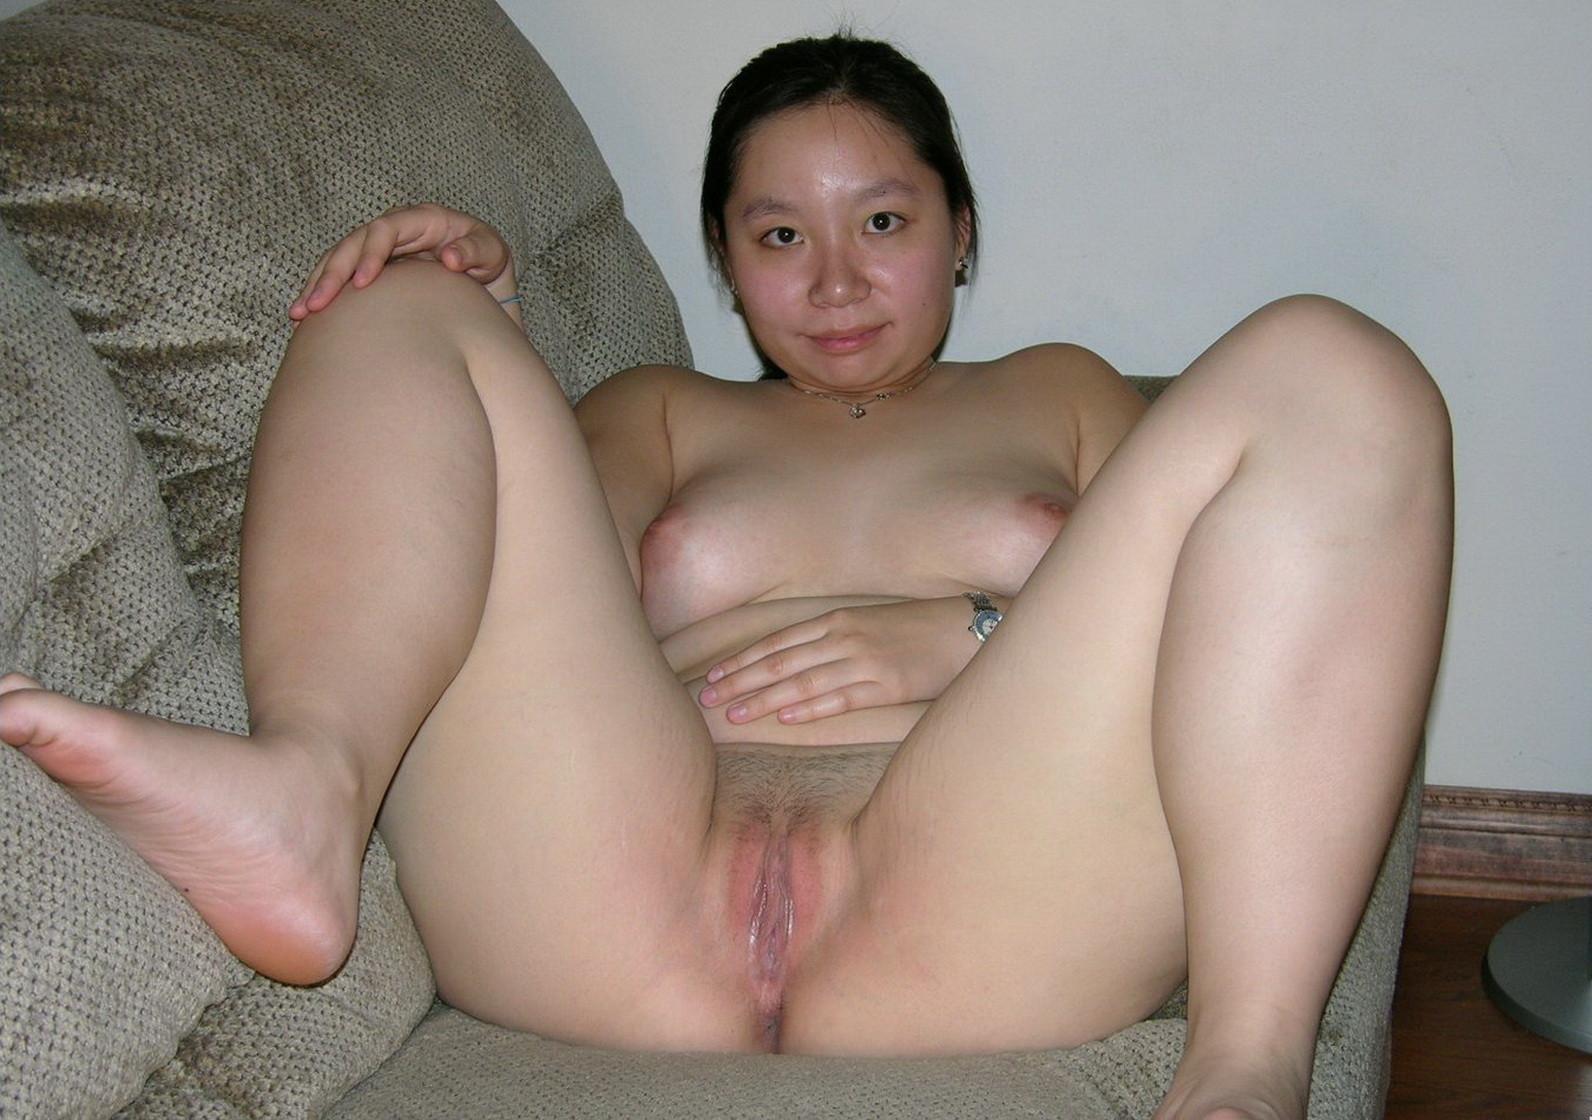 Chubby asian girl naked